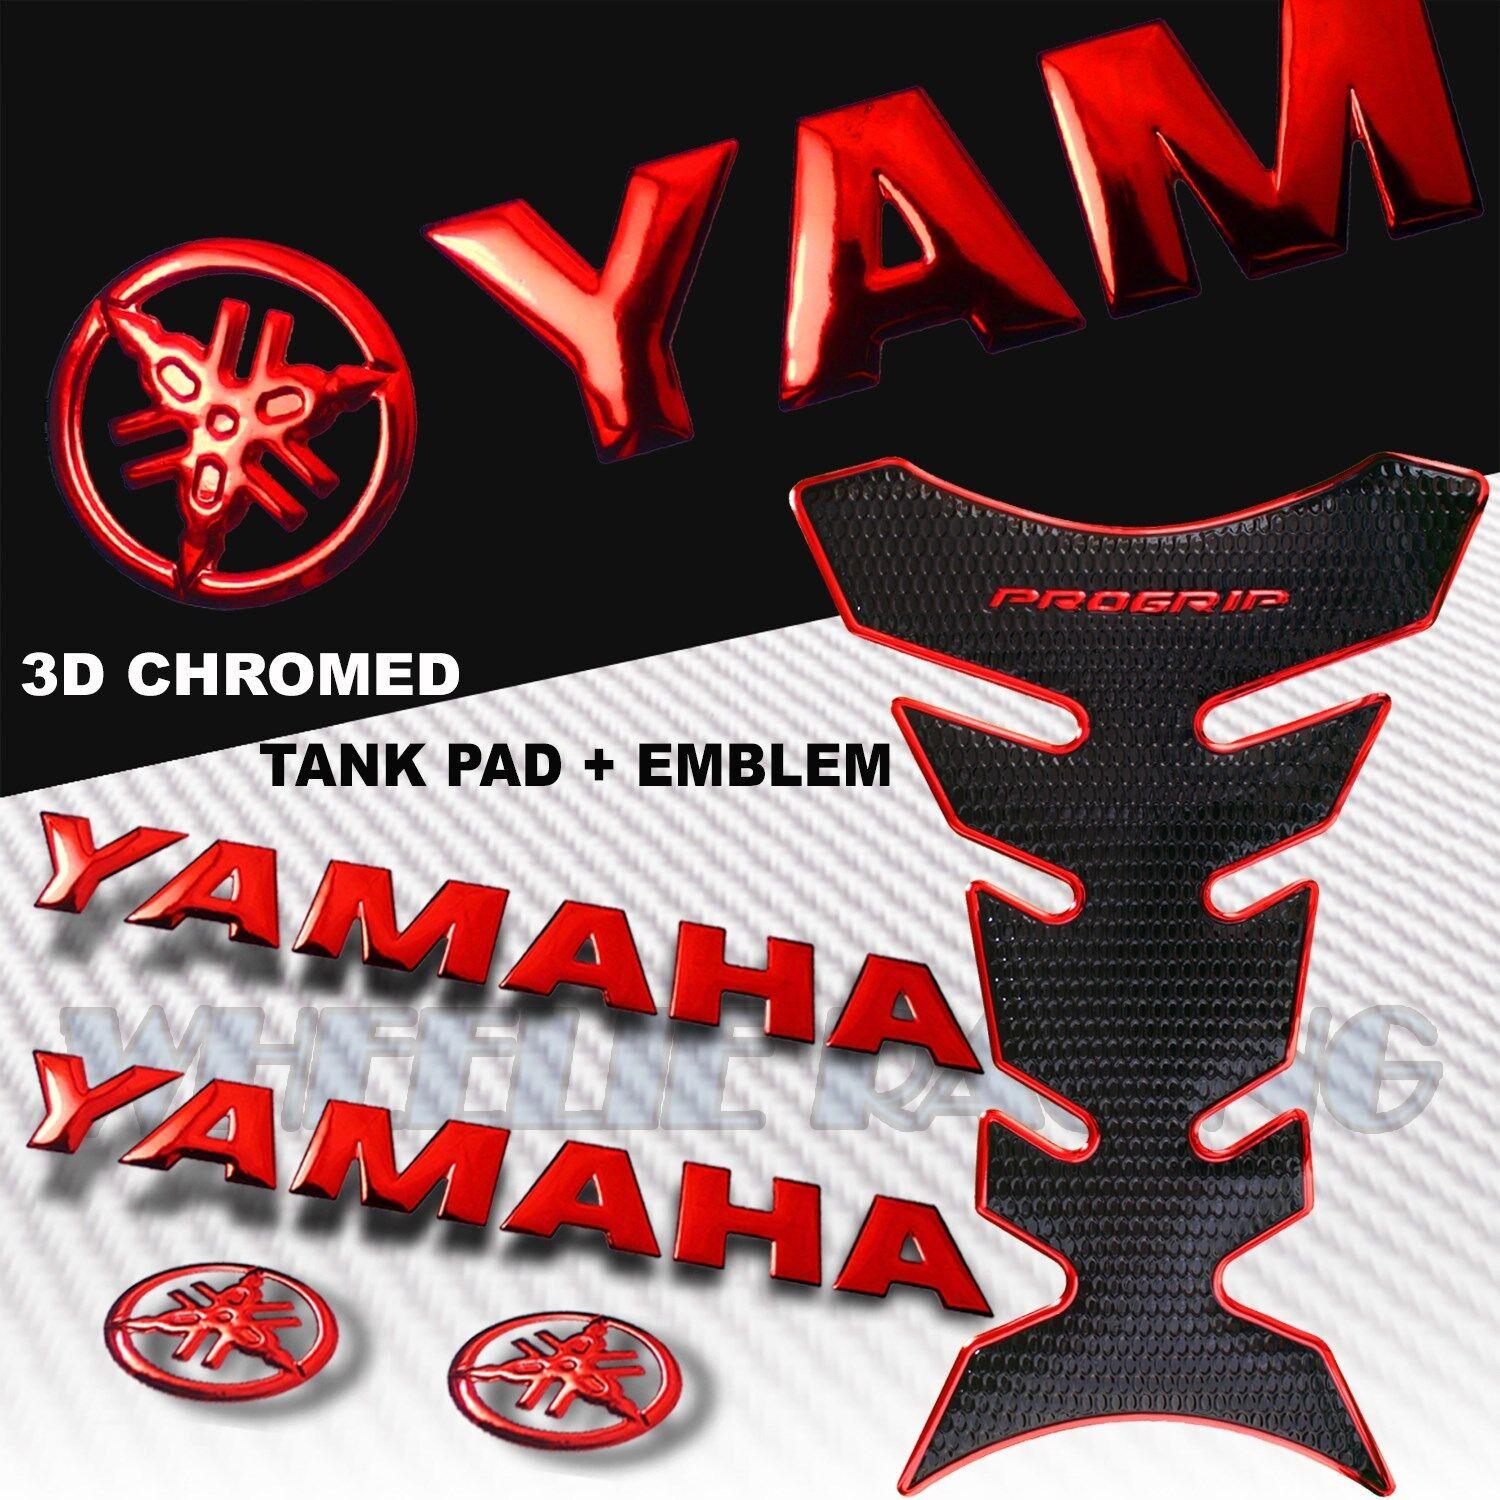 Details about chrome red pro grip fuel tank pad 83d yamaha logo letter fairing emblem sticker